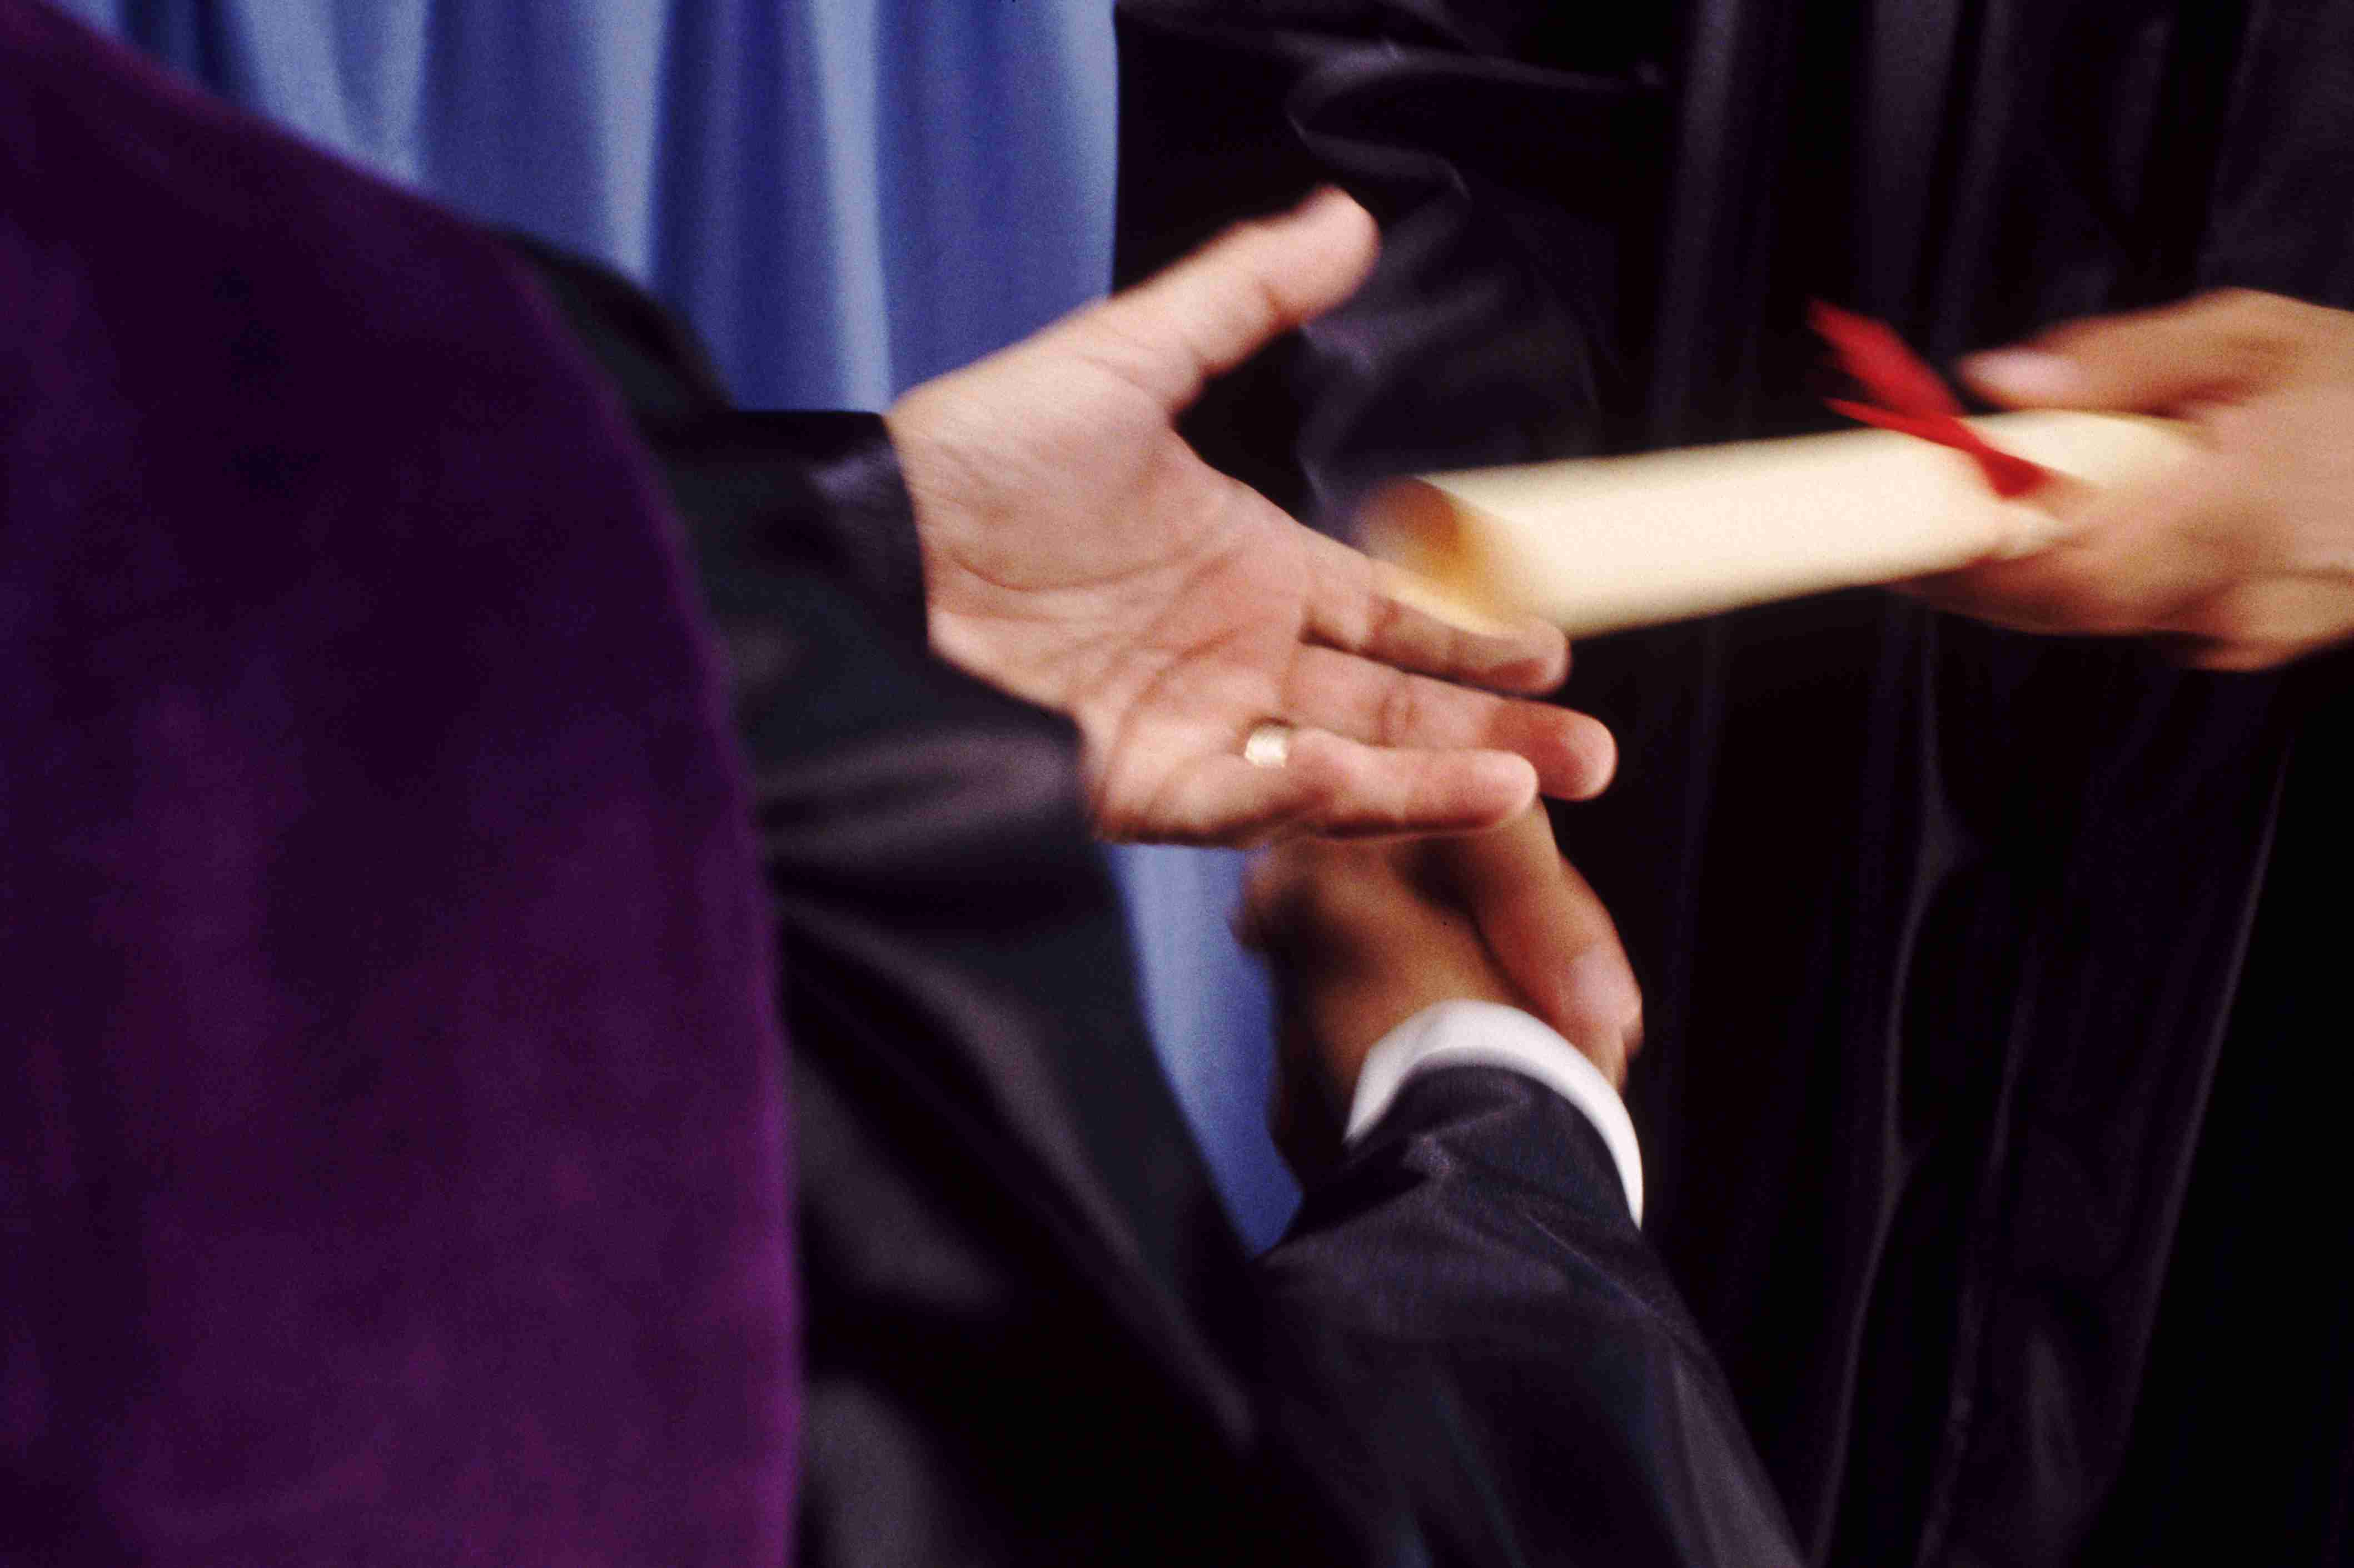 A hand shake and a diploma